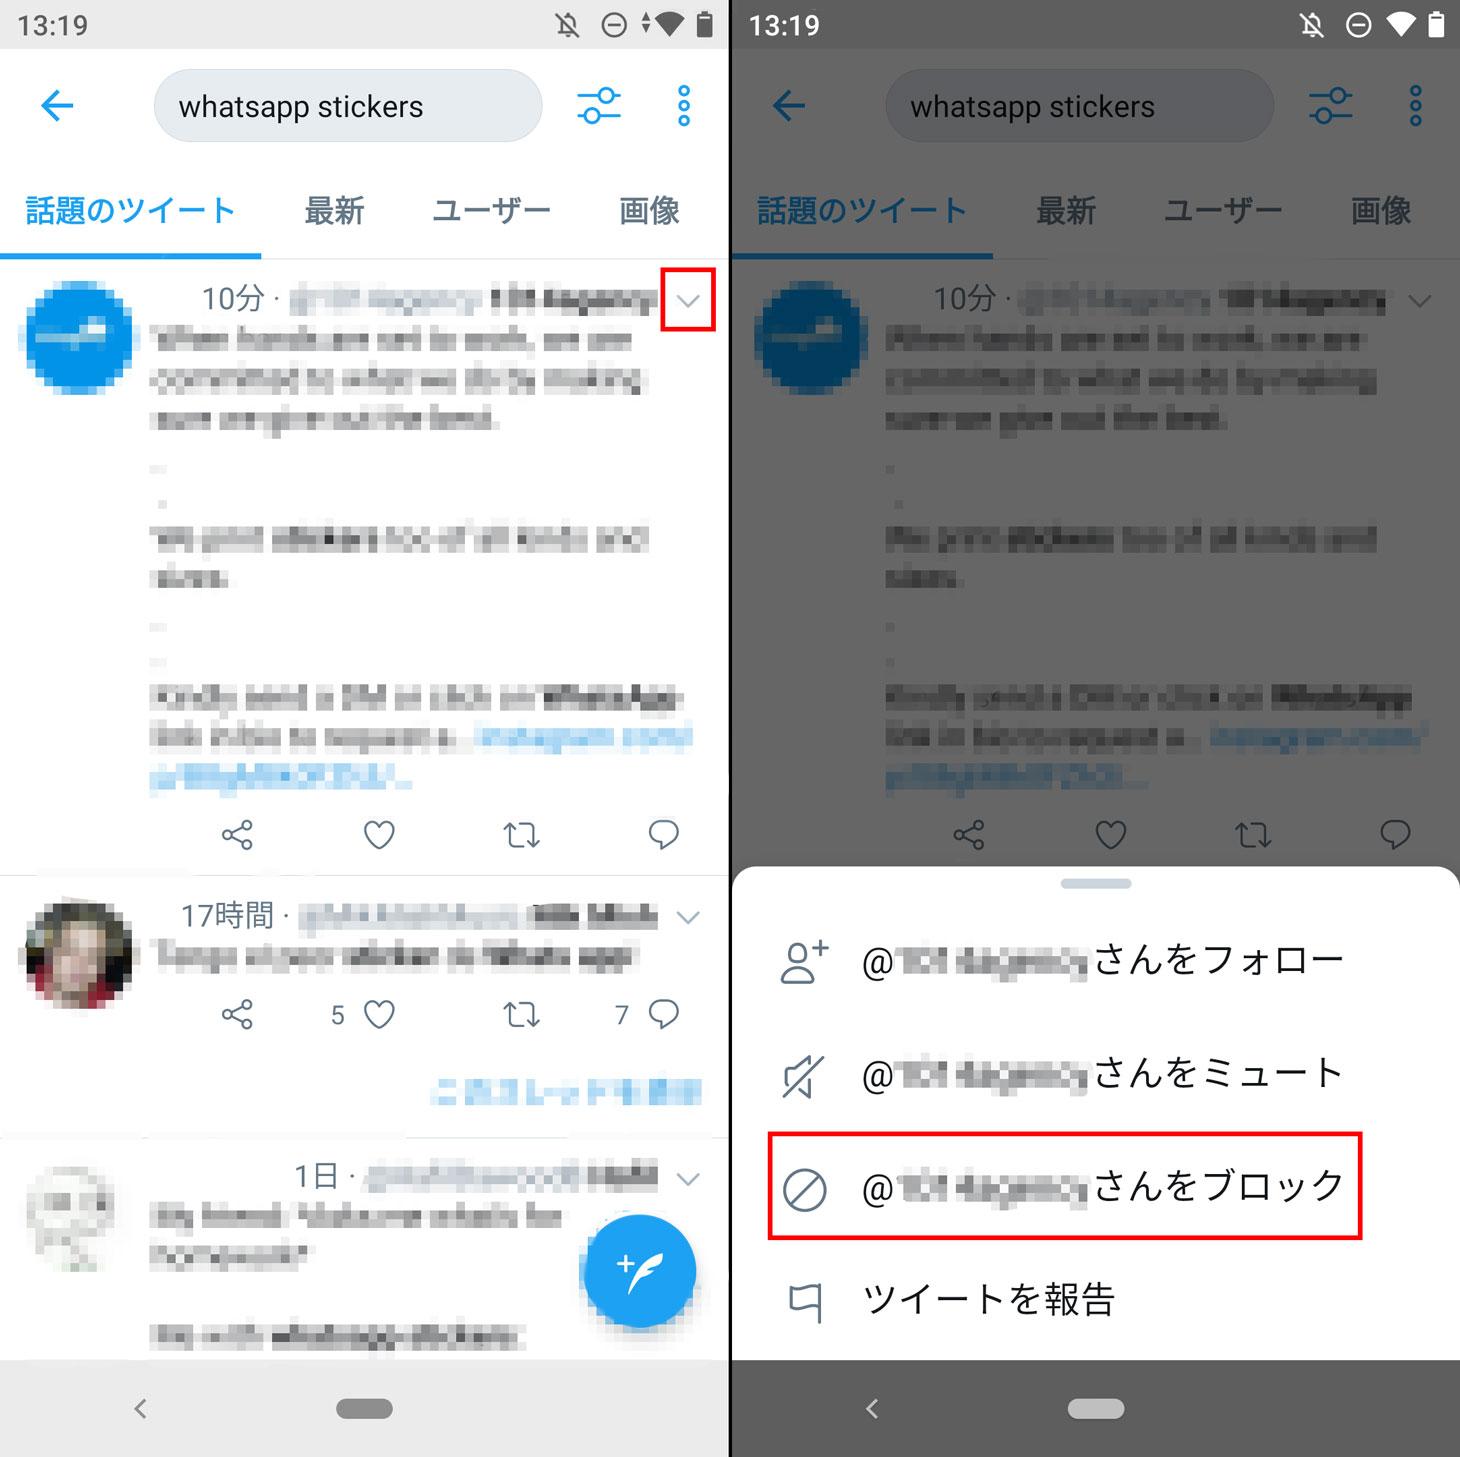 Twitterで特定の人をブロックする方法